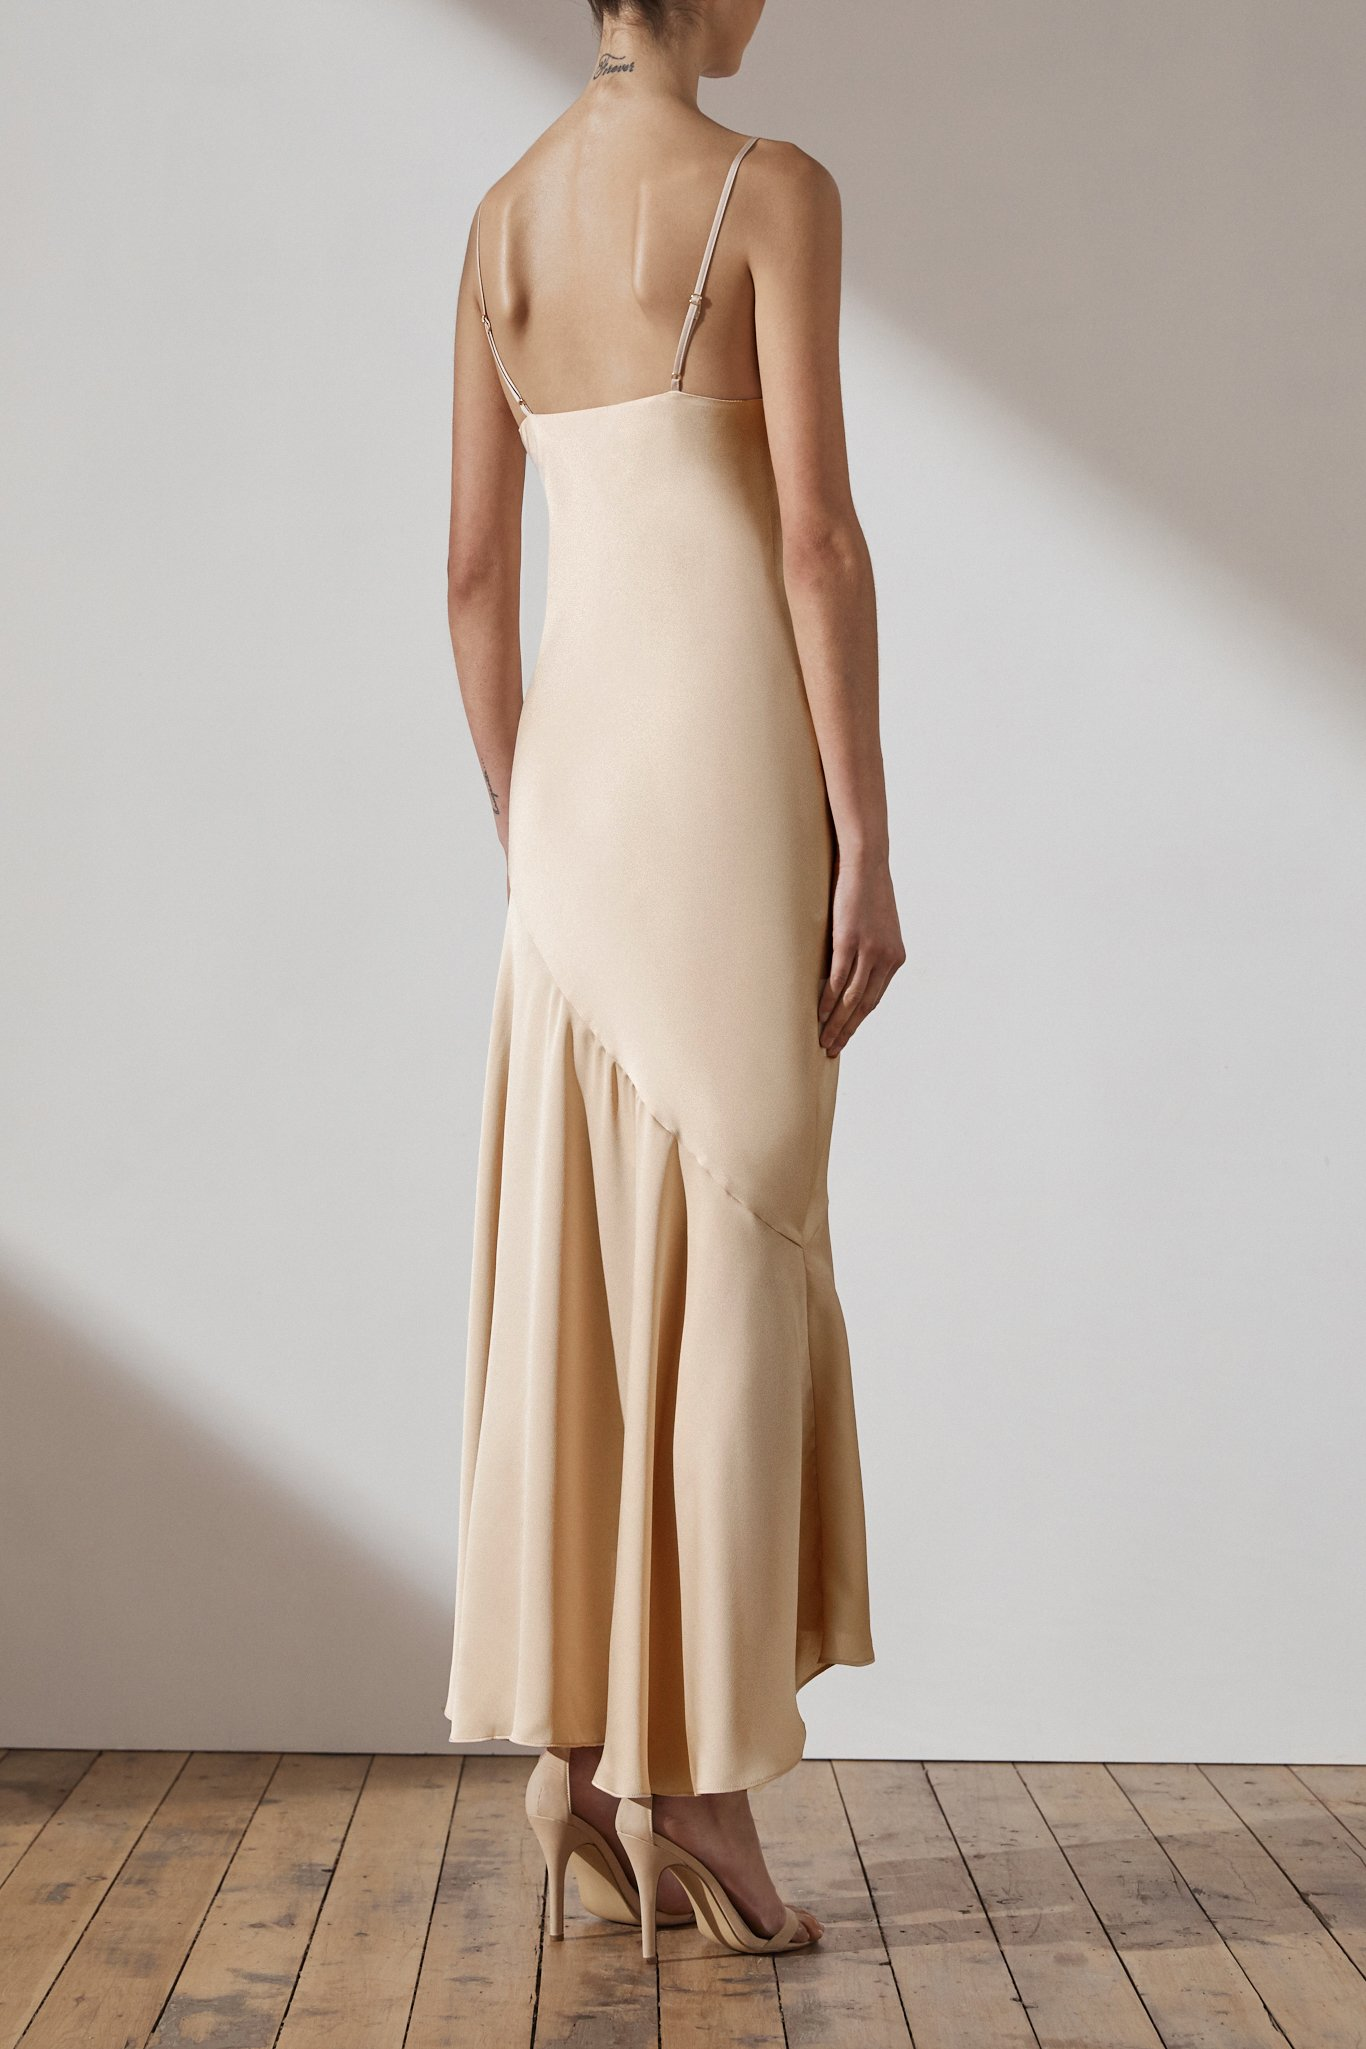 Jamie Luxe Bias Asymmetrical Slip Dress By Shona Joy - Champagne